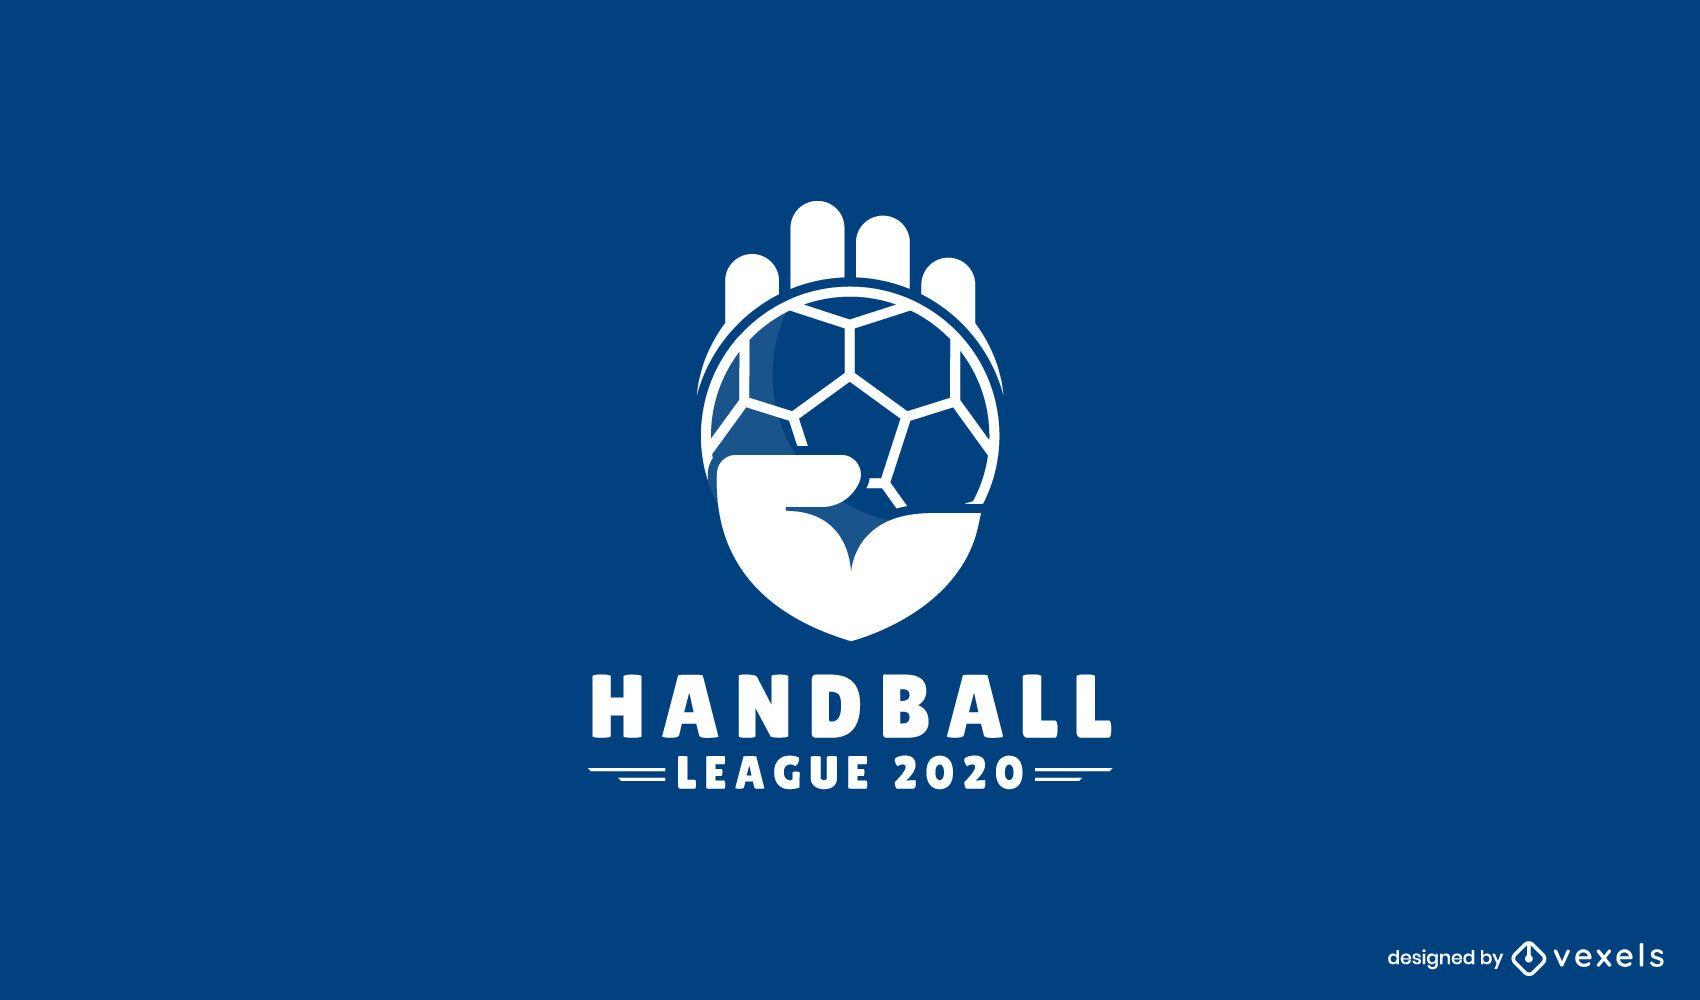 Design de logotipo da liga de handebol